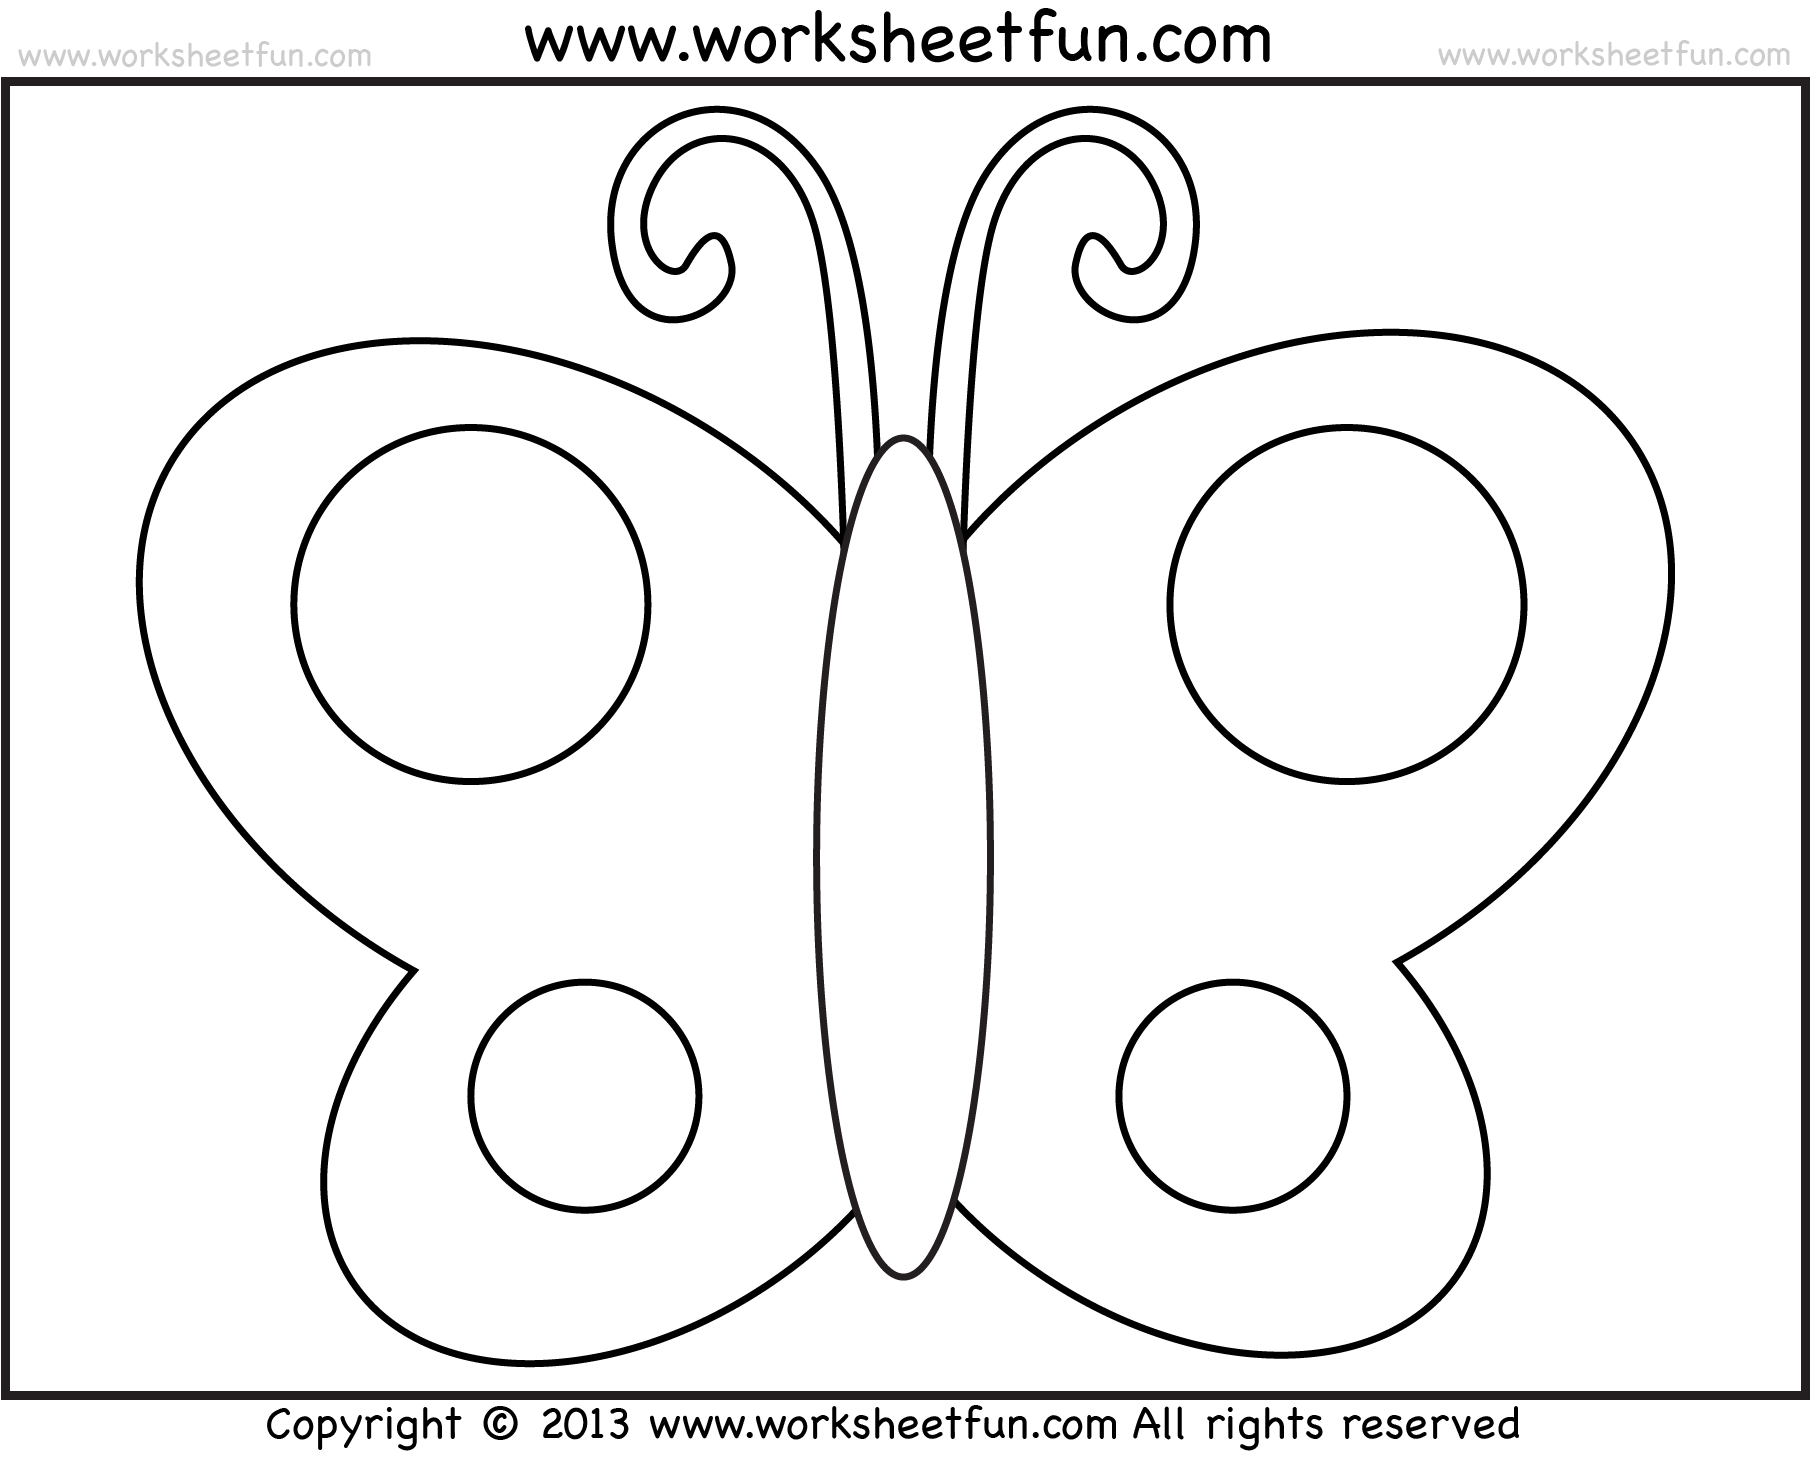 Free Drawing Worksheets At GetDrawings.com